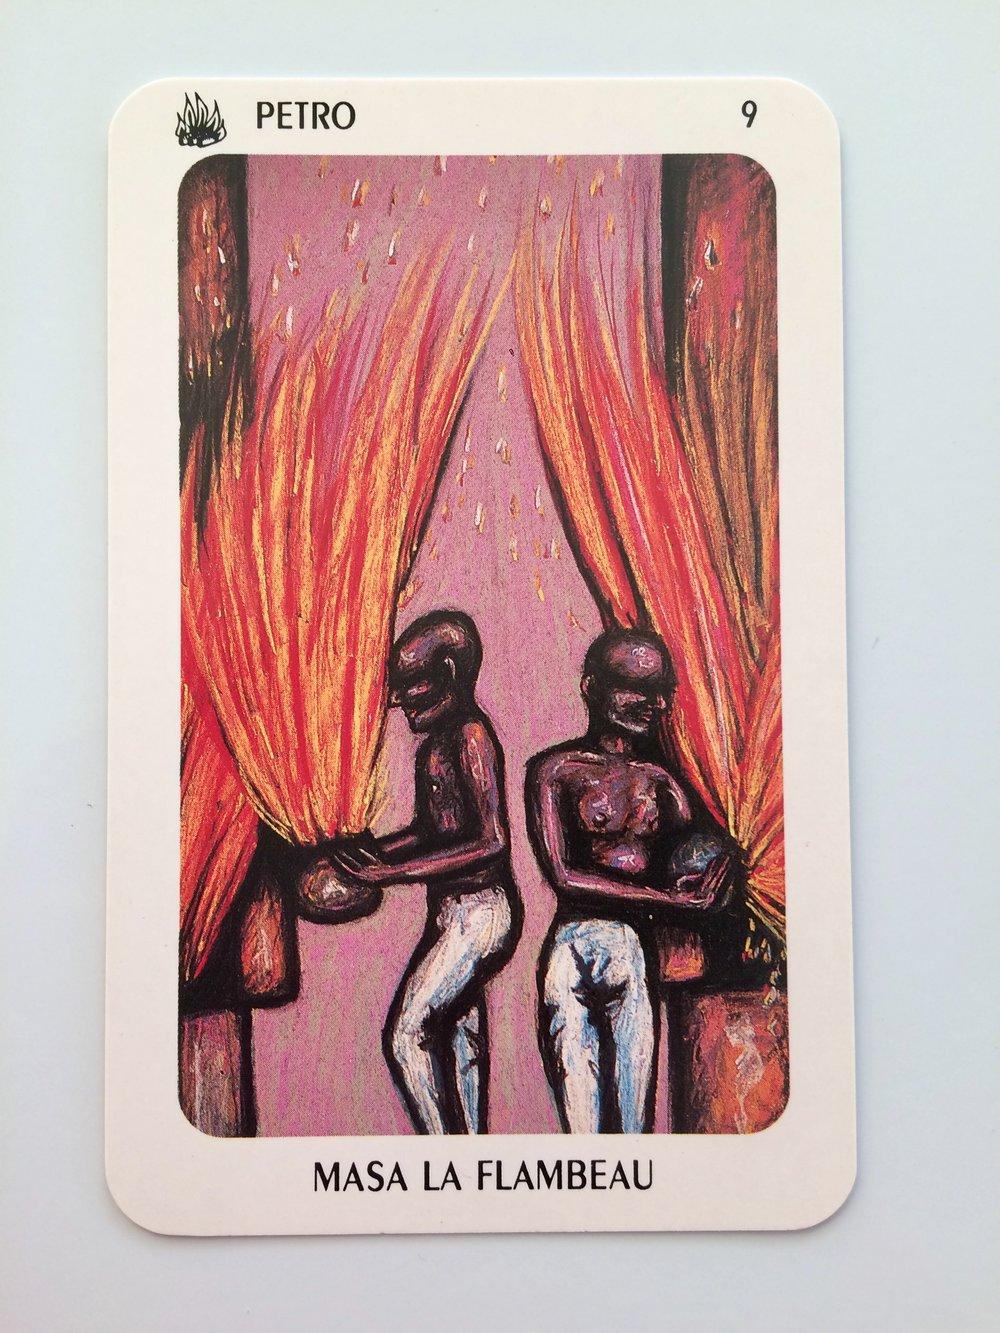 Petro - Nine - Masa La Flambeau from  The New Orleans Voodoo Tarot  deck